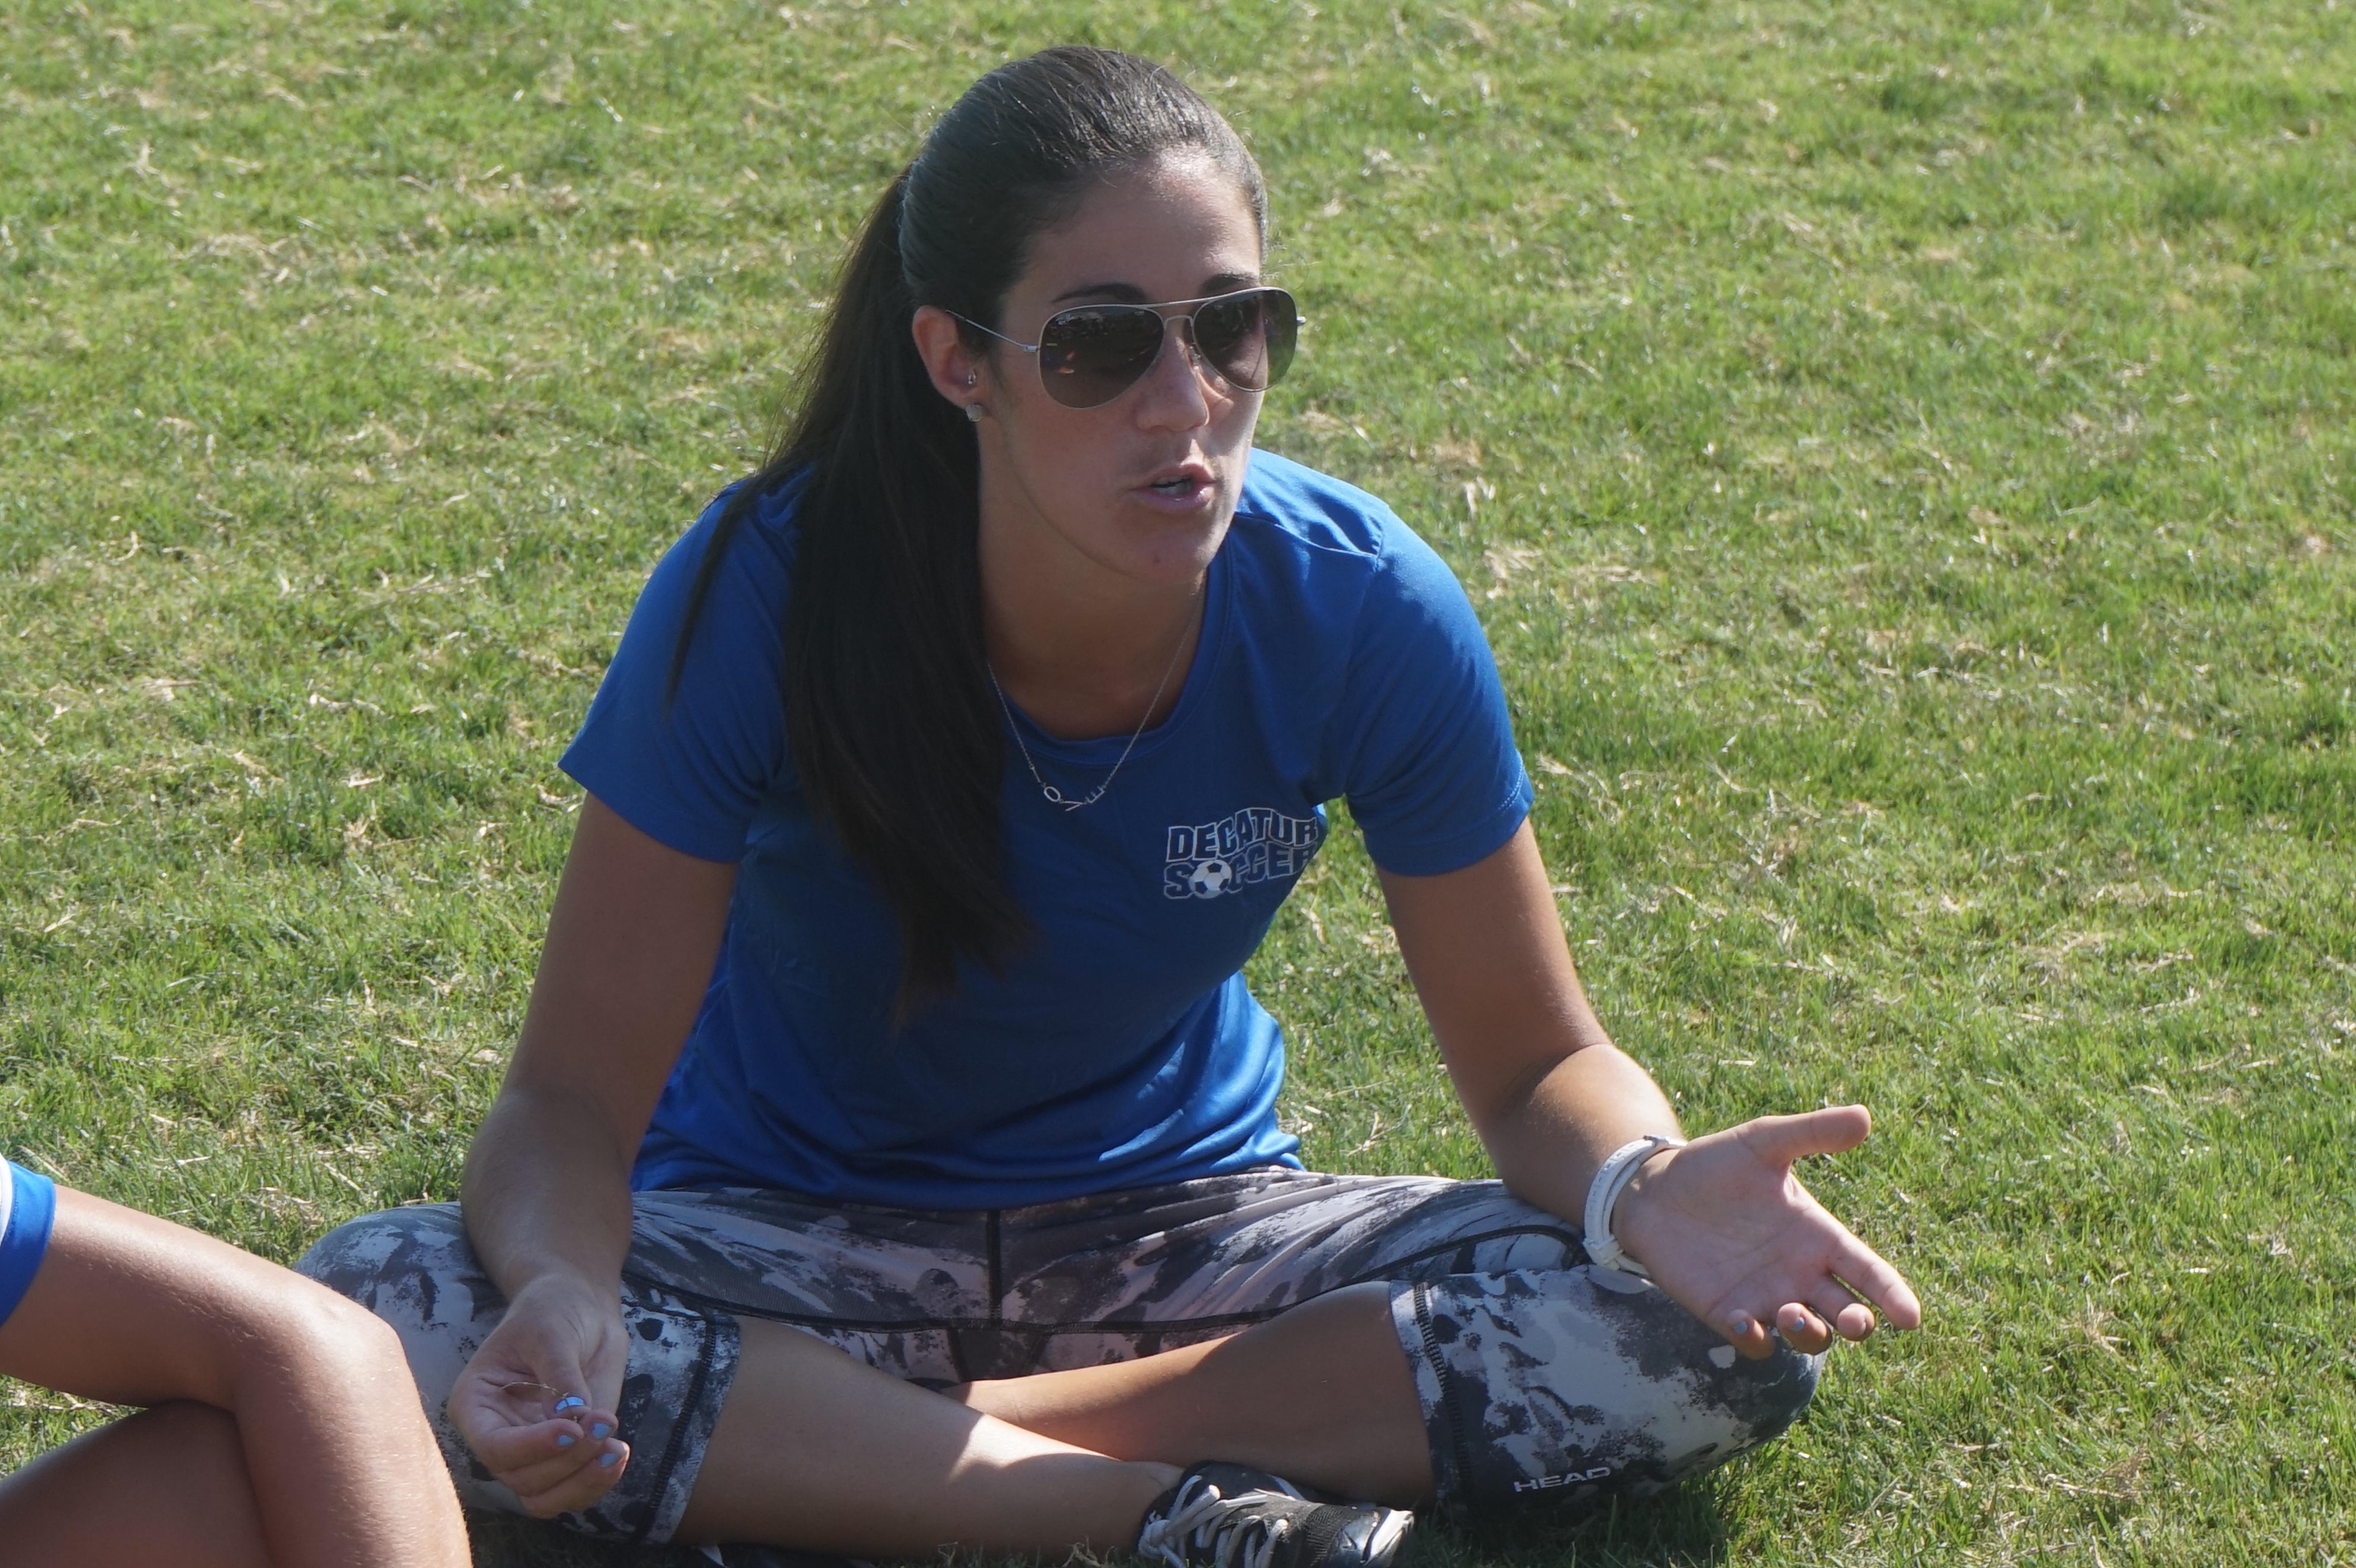 Interview of the Week – Maggie Berke, Stephen Decatur Girls Soccer Head Coach